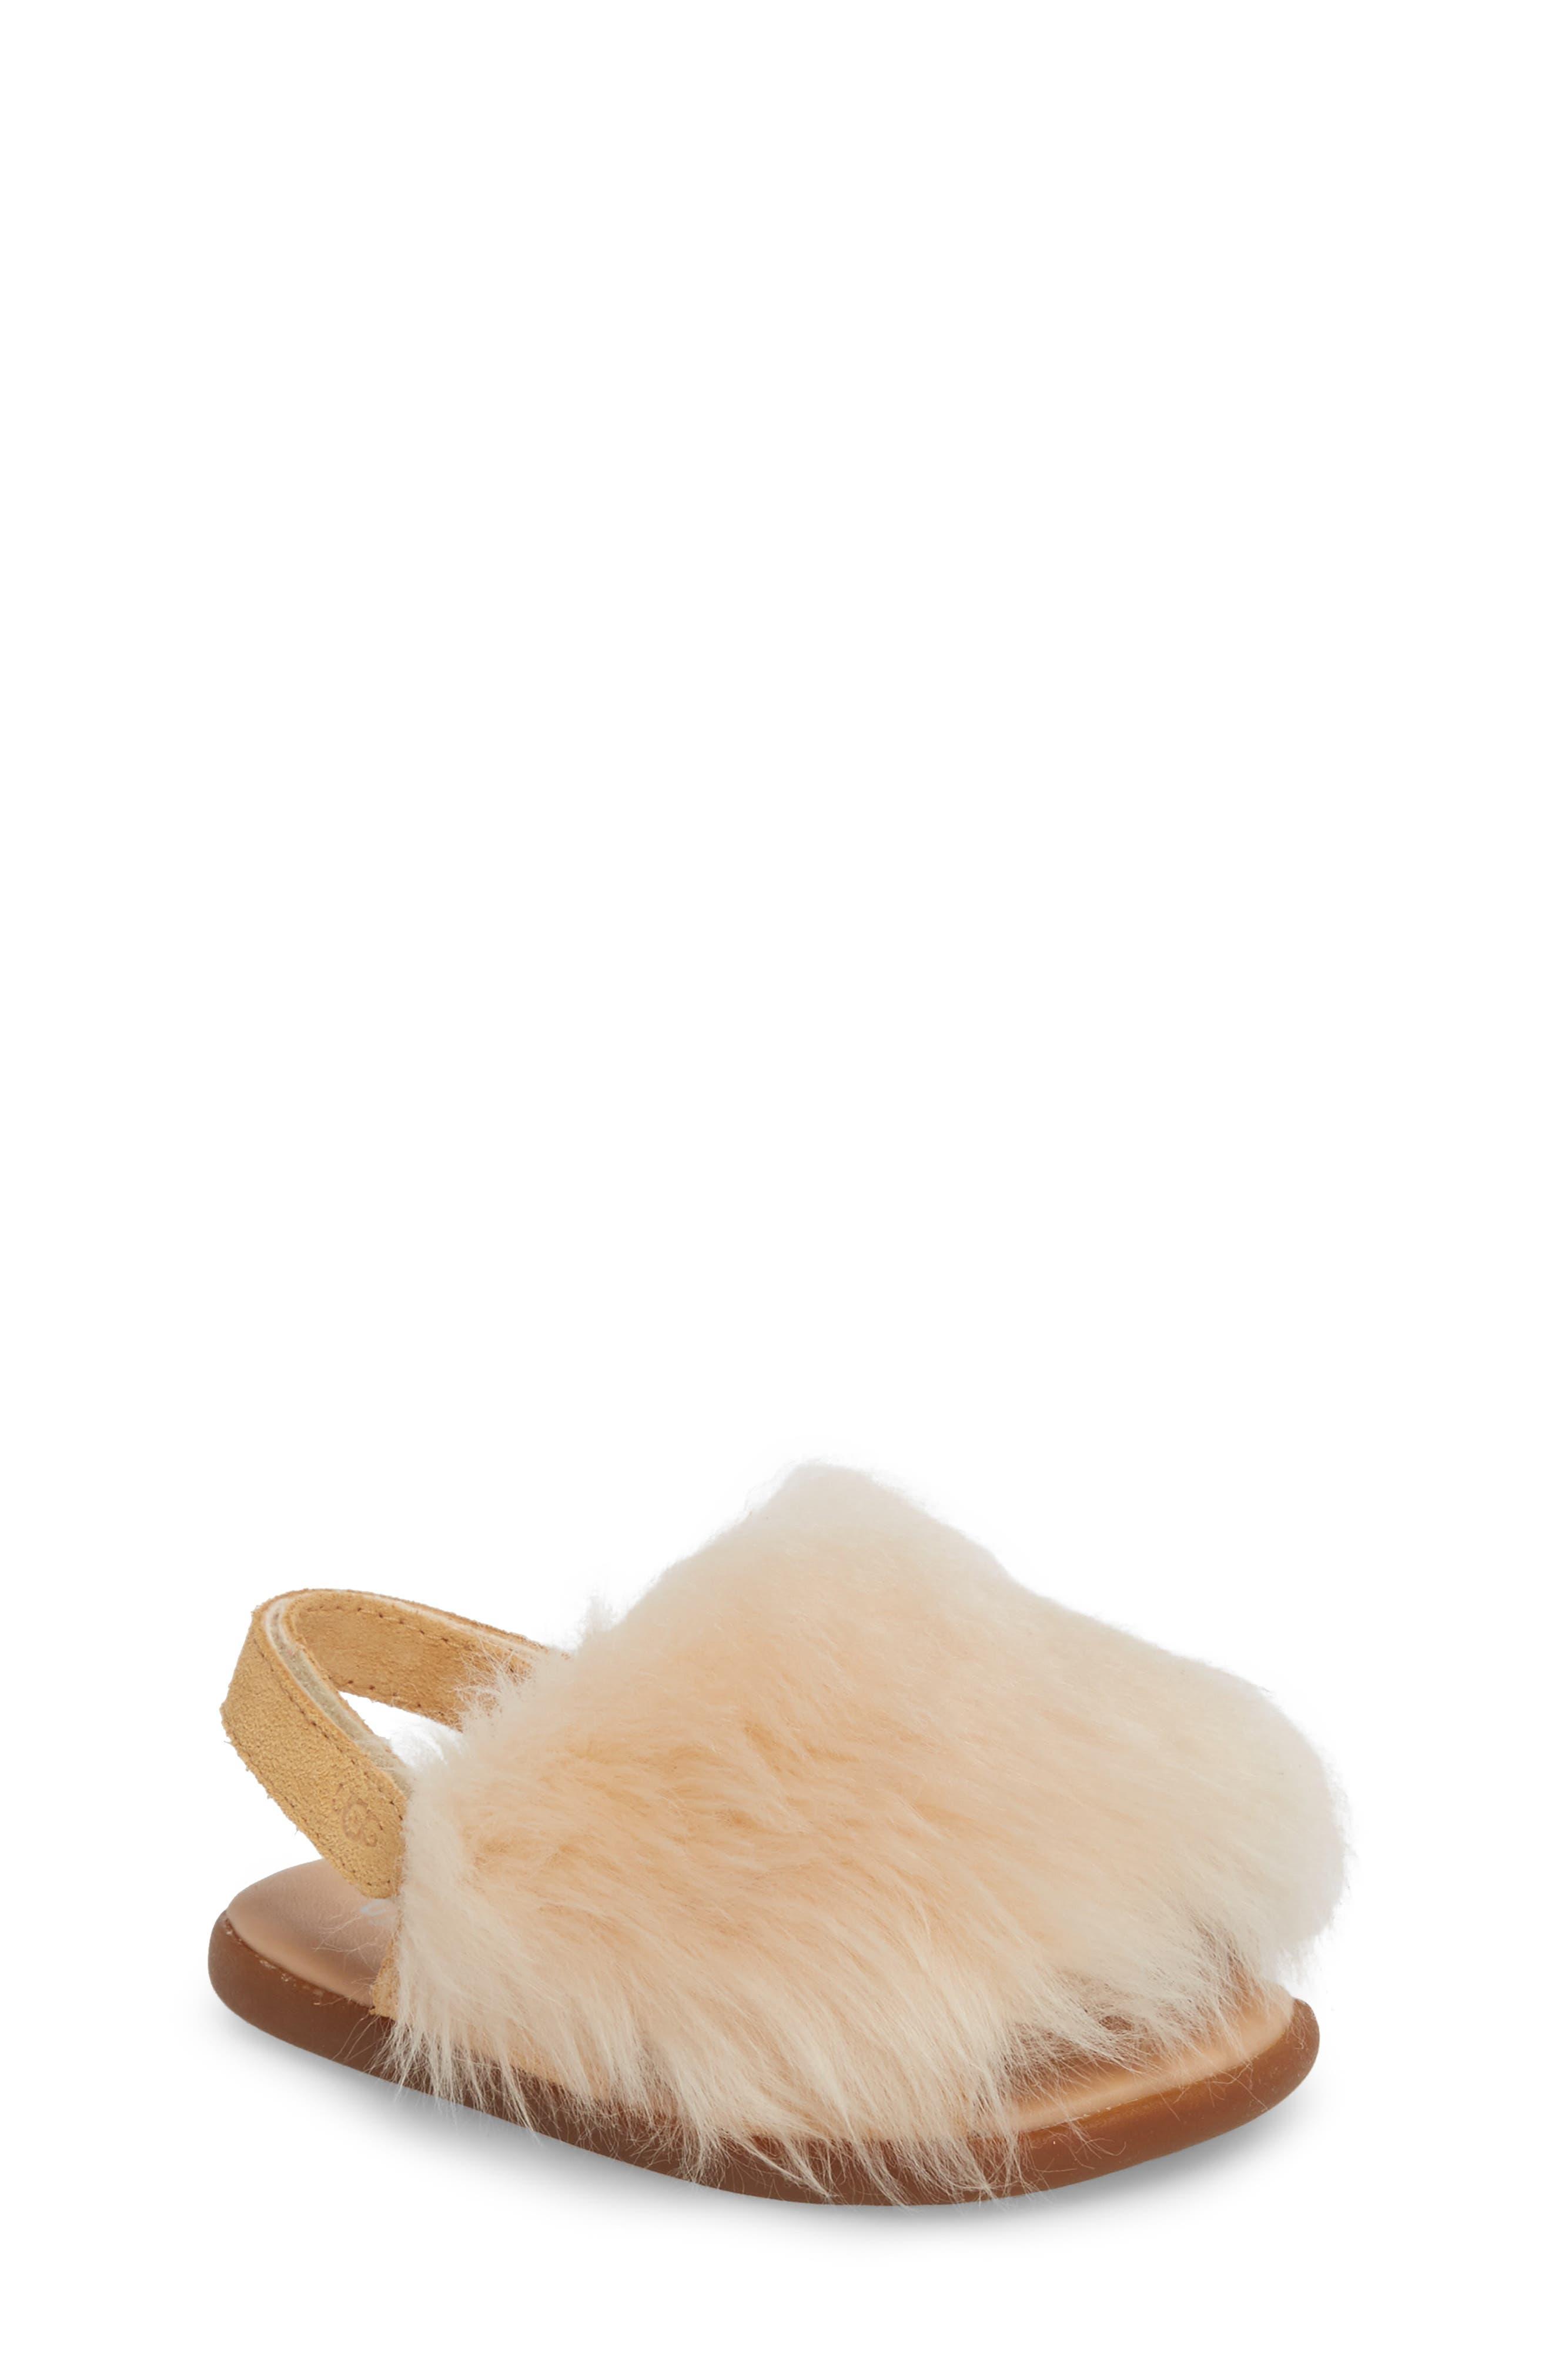 Holly Genuine Shearling Sandal,                             Main thumbnail 1, color,                             Soft Ochre